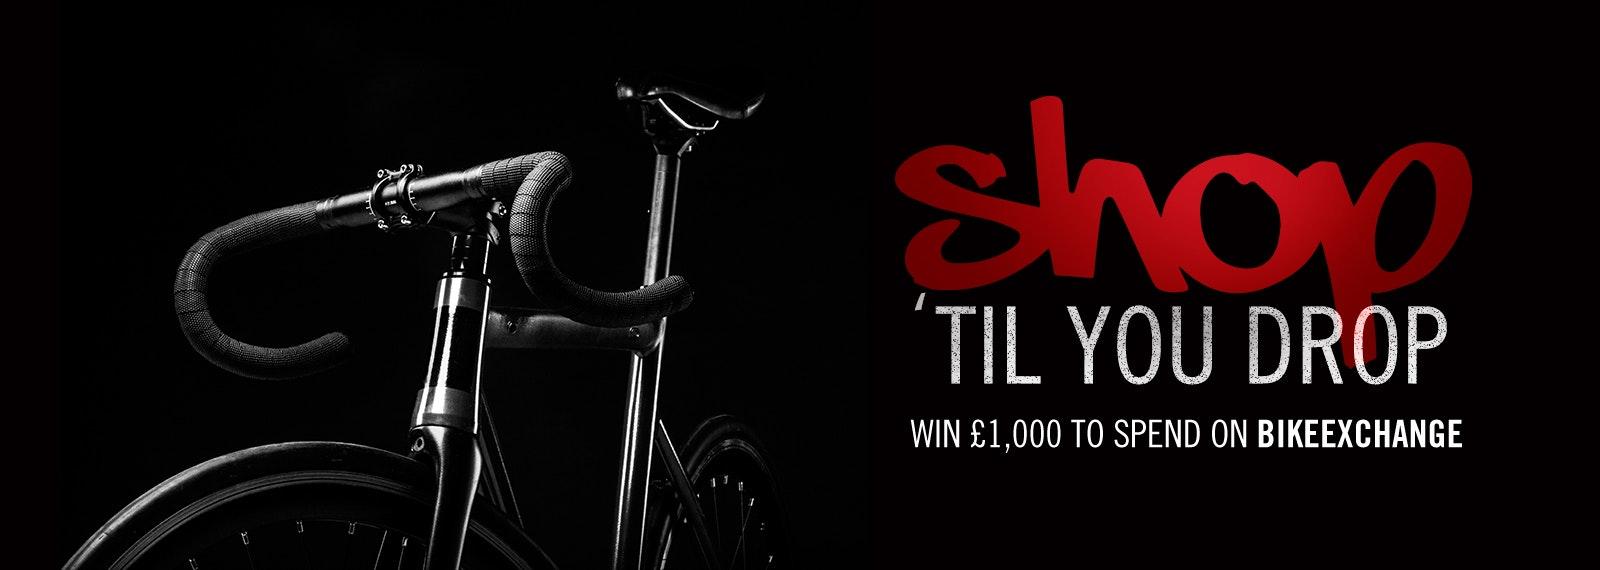 Competition - win spending money on BikeExchange